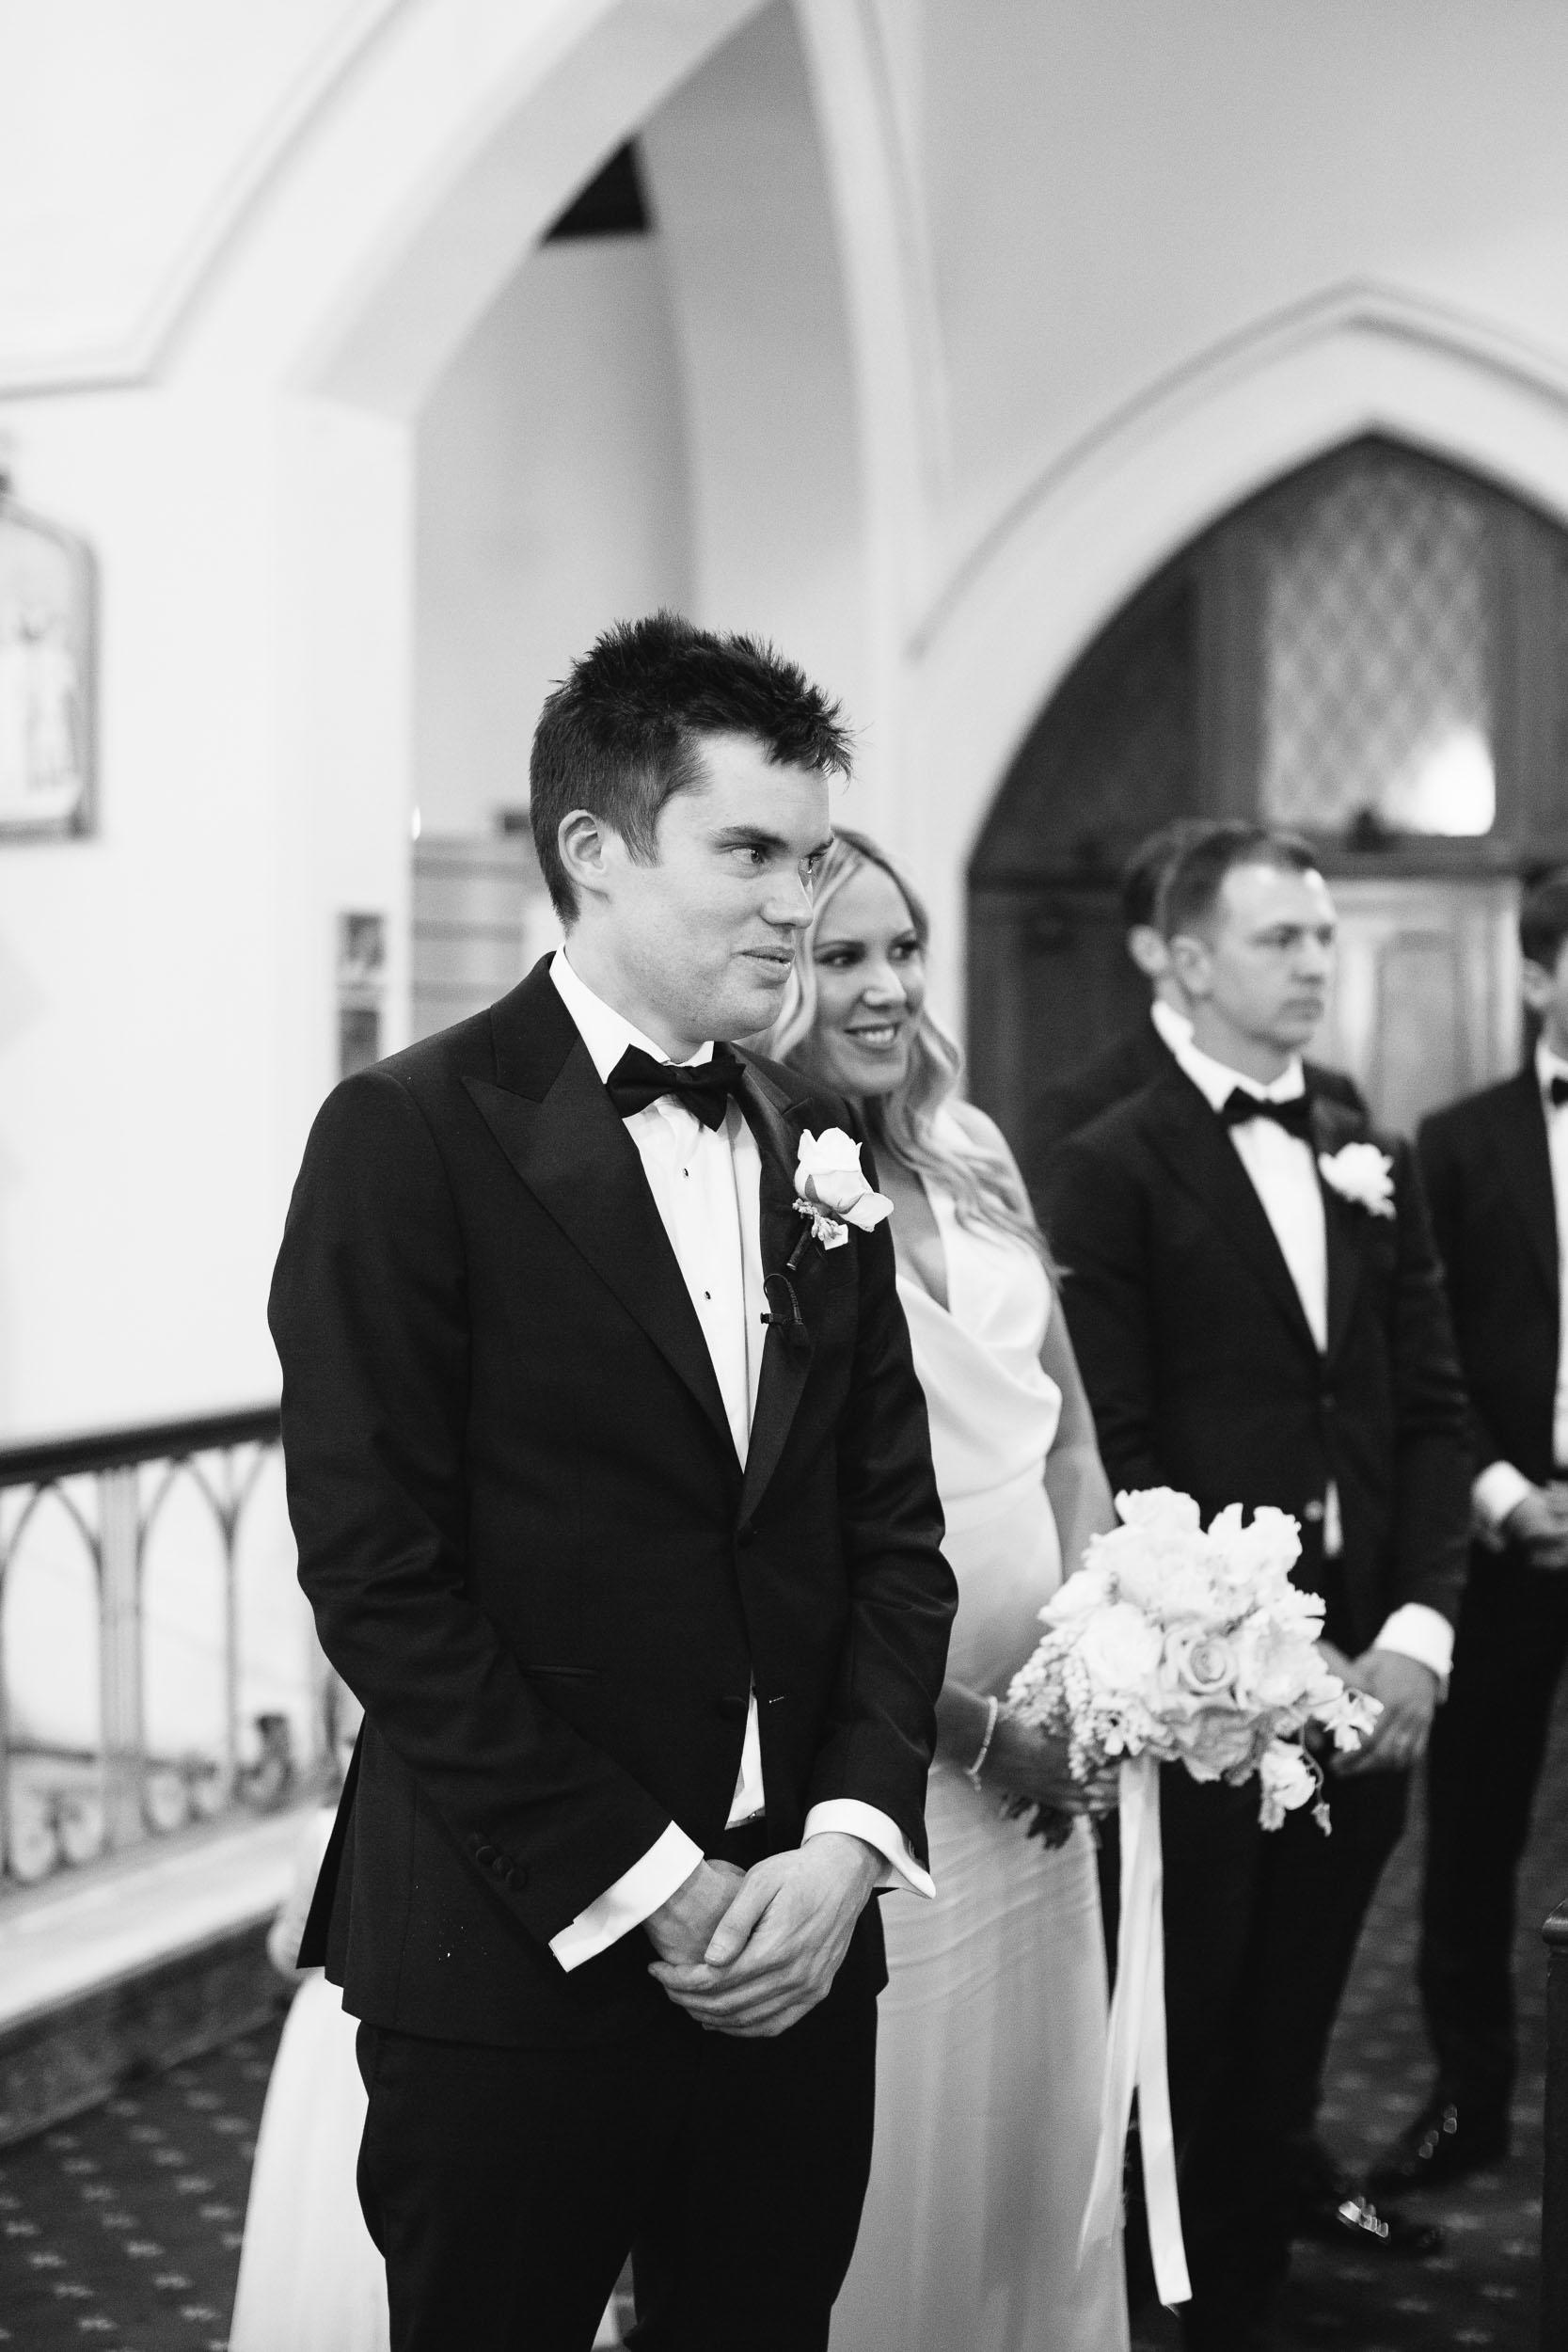 Kas-Richards-Wedding-Photographer-Melbourne-City-Wedding-Alto-Event-Space-Jane-Hill-Bridal-Gown-25.jpg